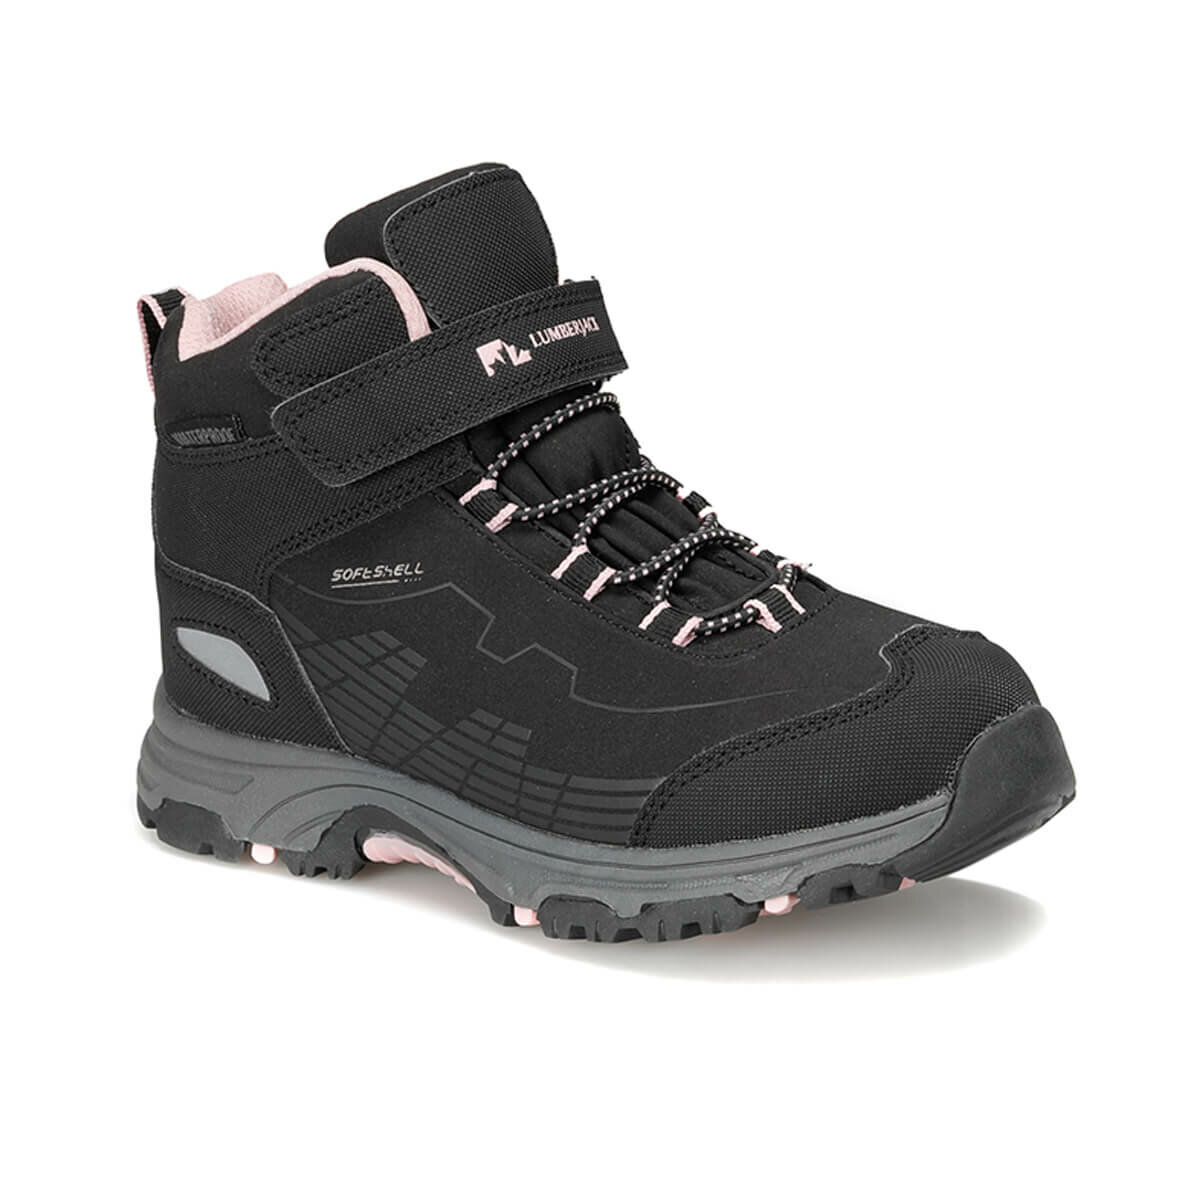 FLO CHAMP HI 9PR Black Female Child Boots LUMBERJACK